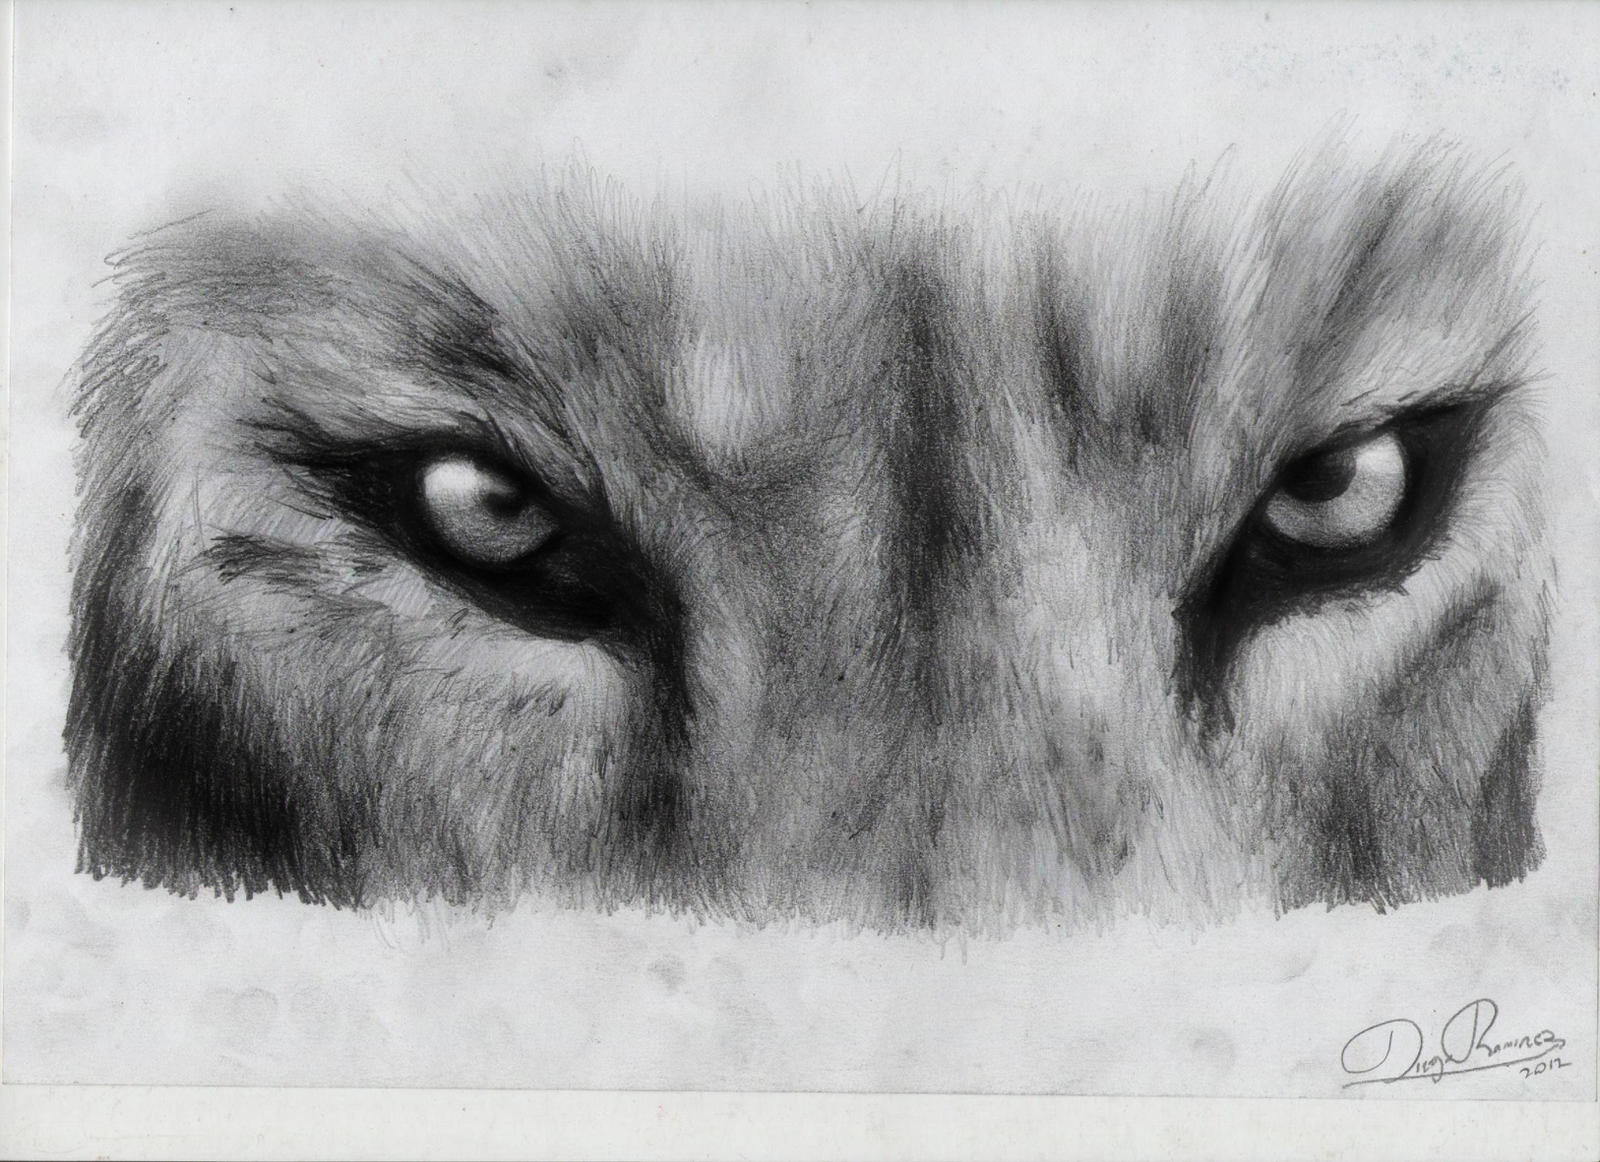 mirada de leon by diegora on DeviantArt